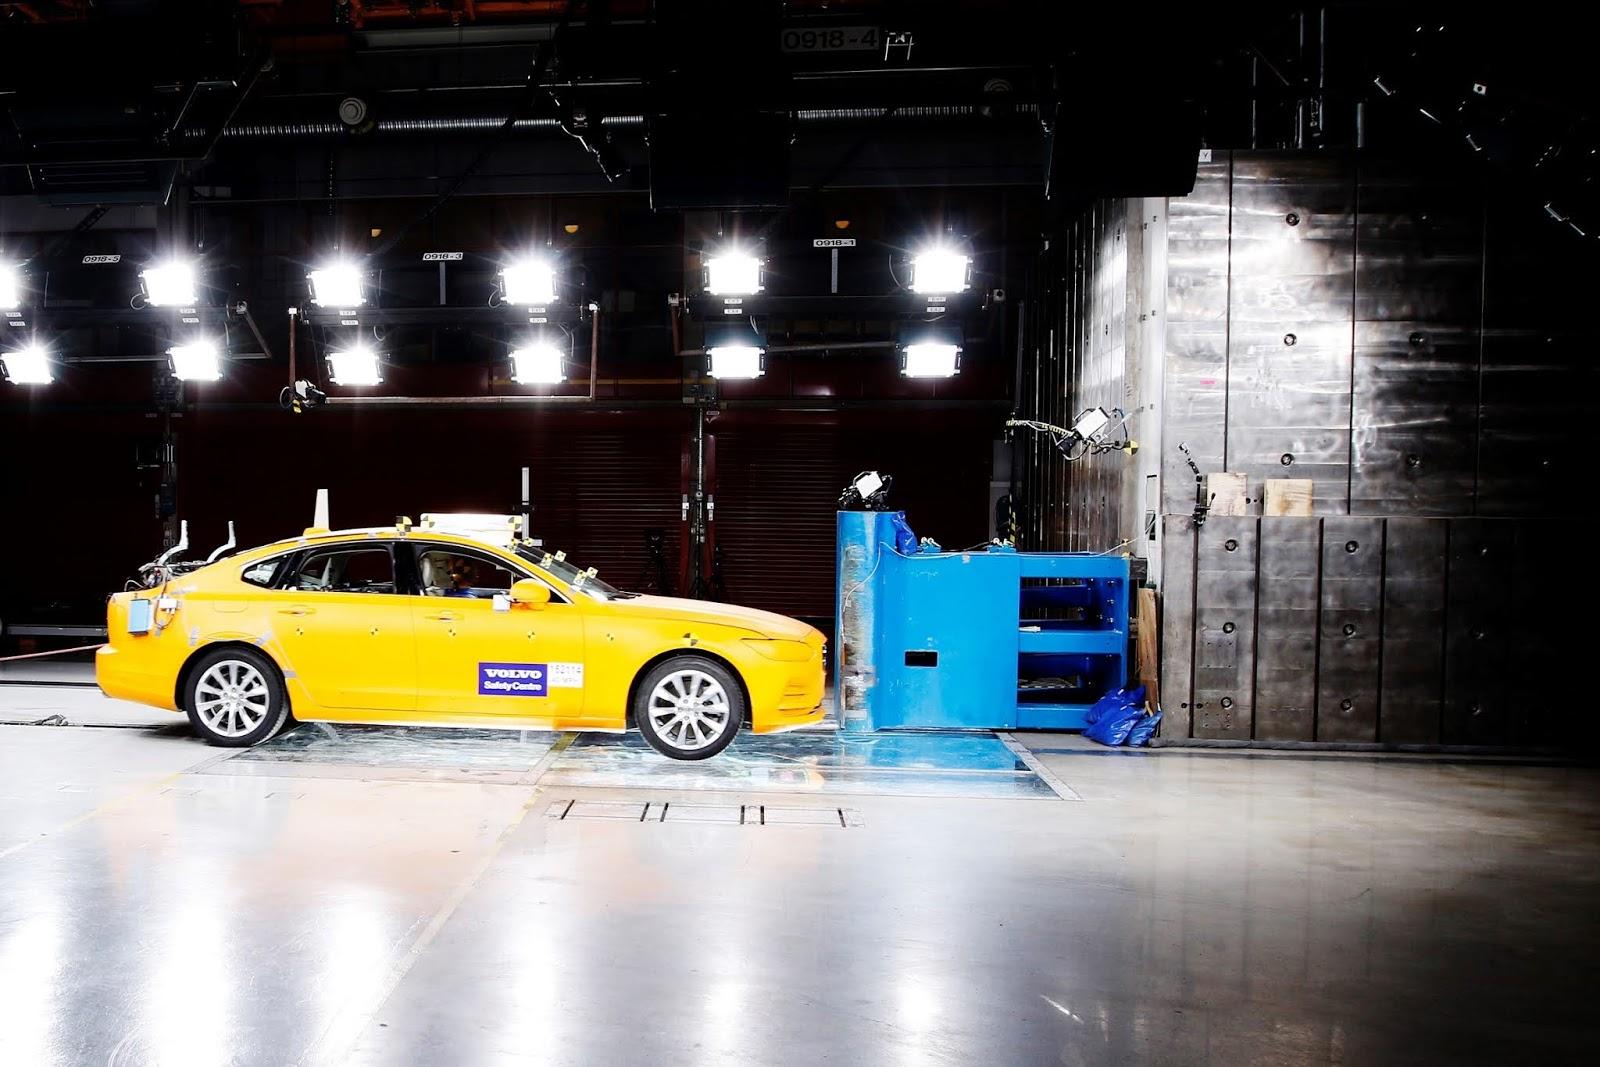 172071 Volvo S90 Small Overlap Crash Test 20 χρόνια Volvo Cars Safety Centre : Δύο δεκαετίες, σώζει ζωές crash tests, Volvo, Volvo Cars, ασφάλεια, ειδήσεις, καινοτομία